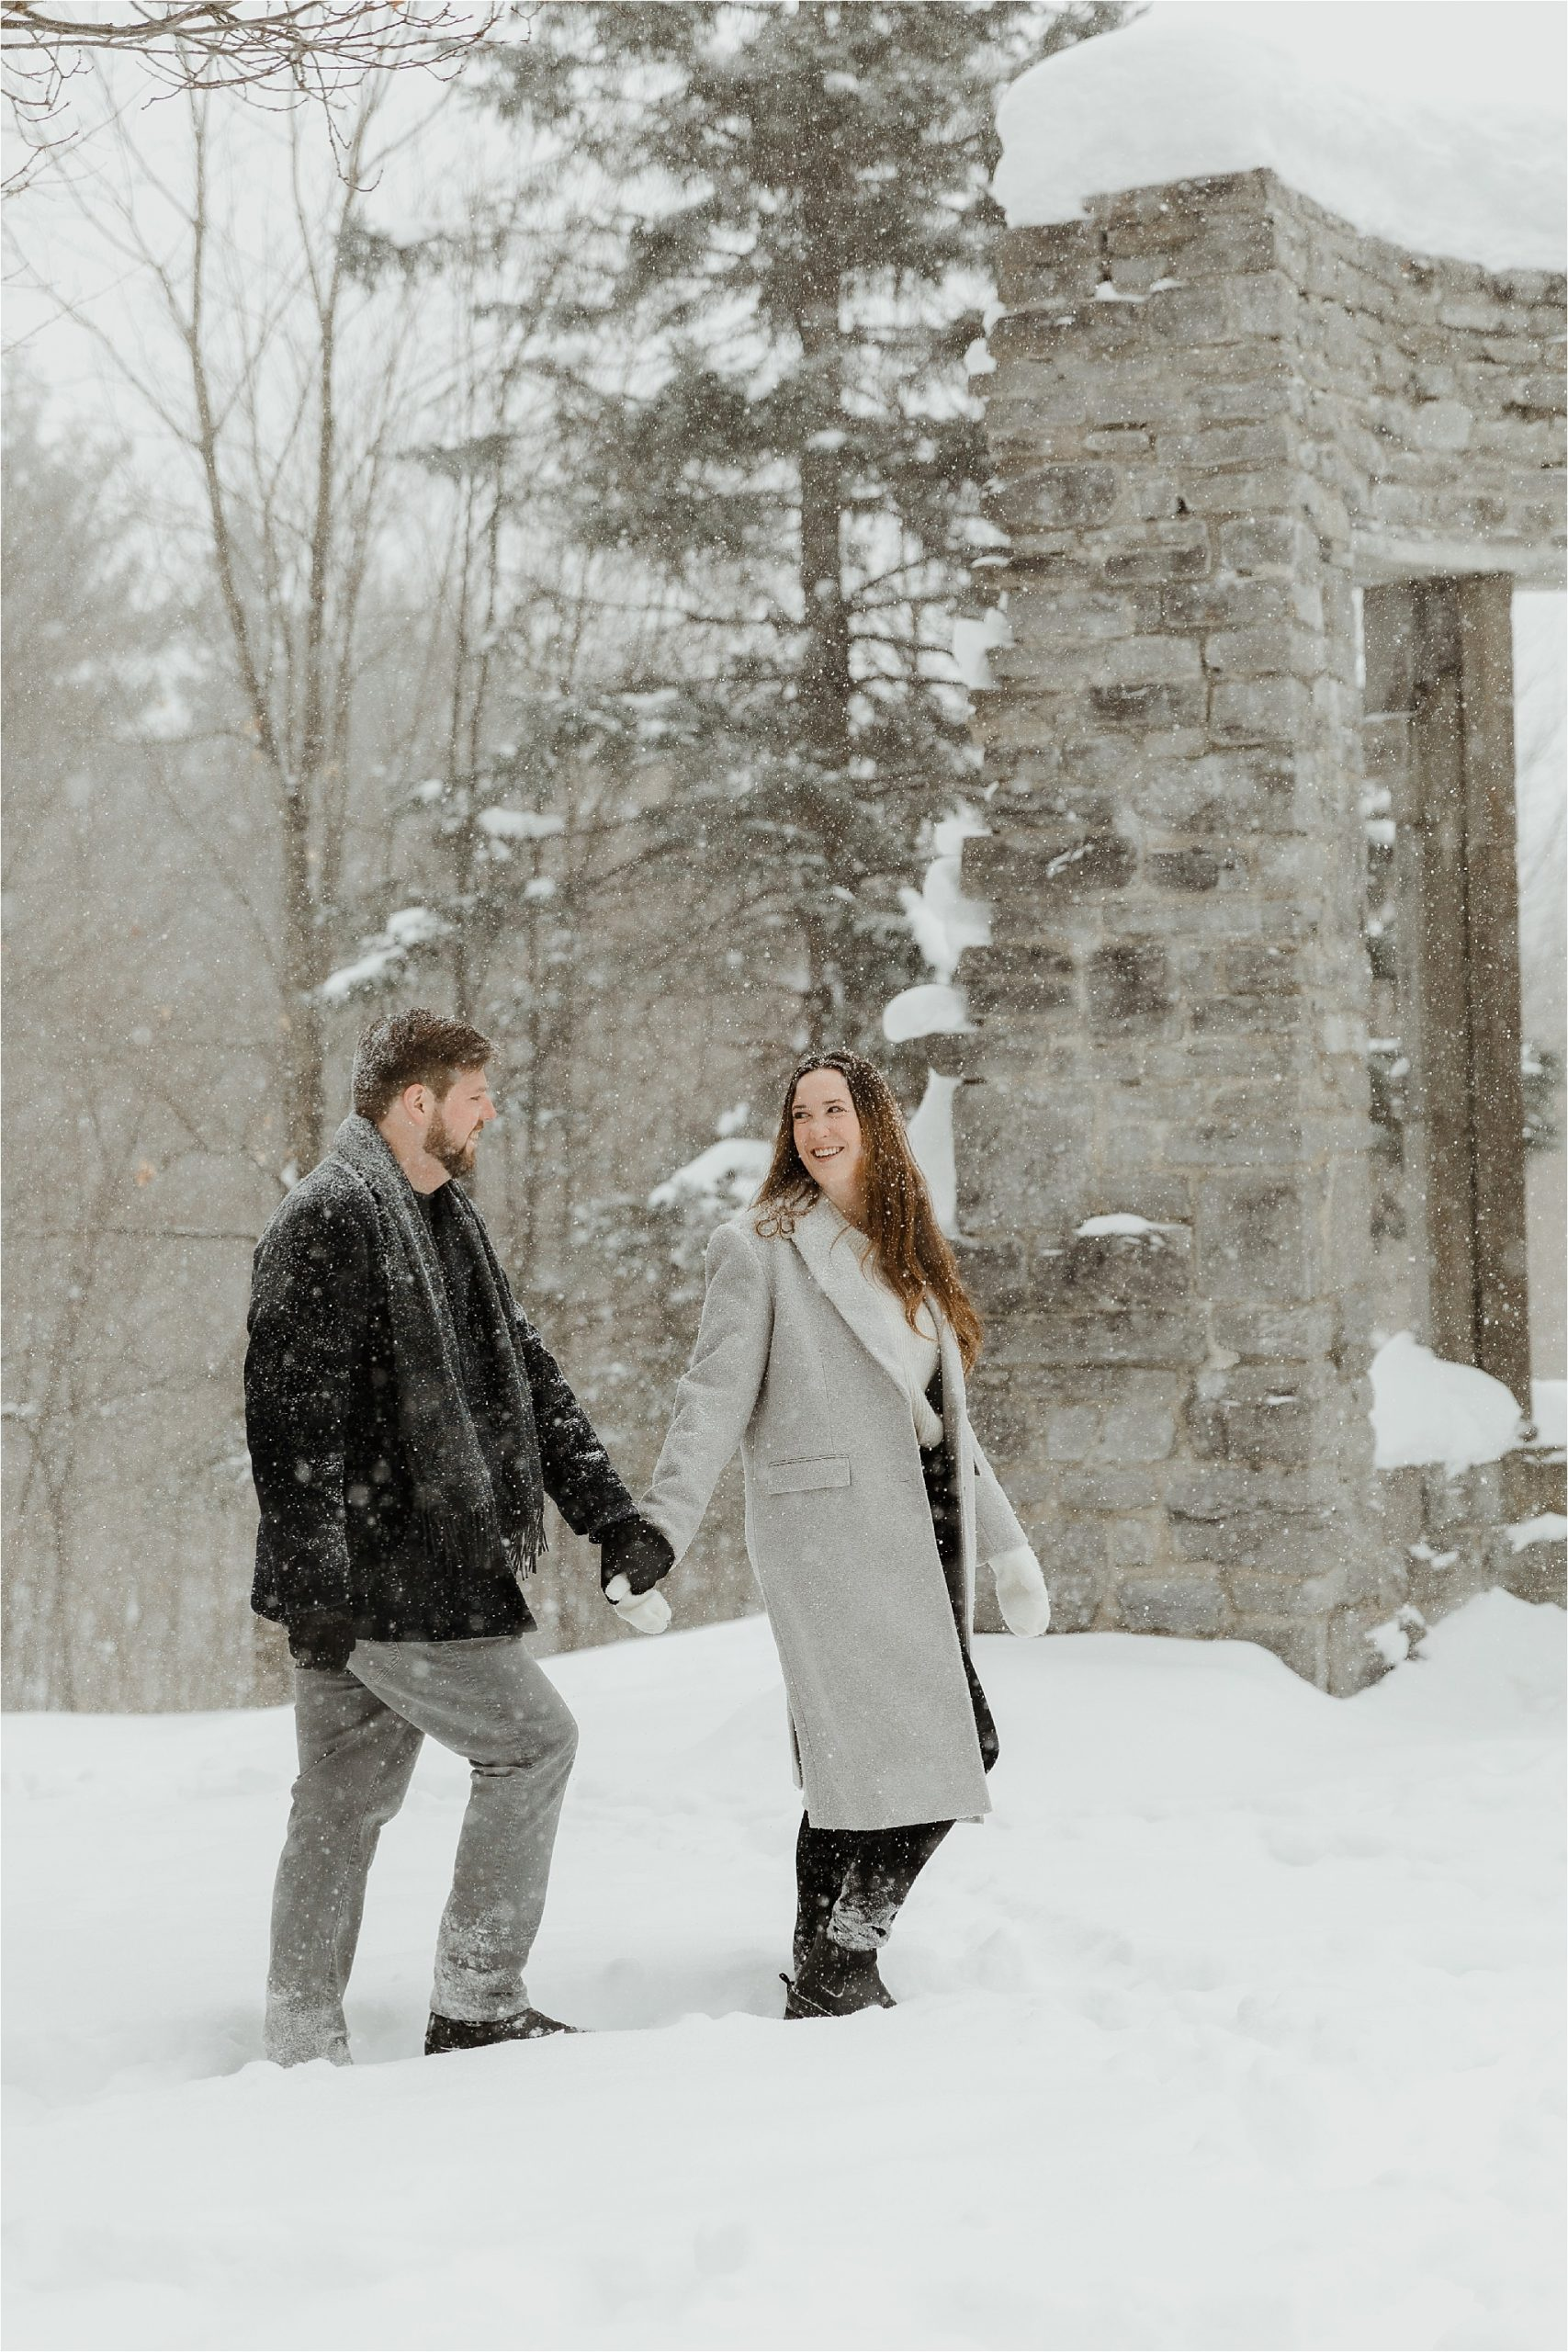 Snowy winter engagement photo shoot at McKenzie King Estates in Gatineau Park - Ottawa wedding photographer